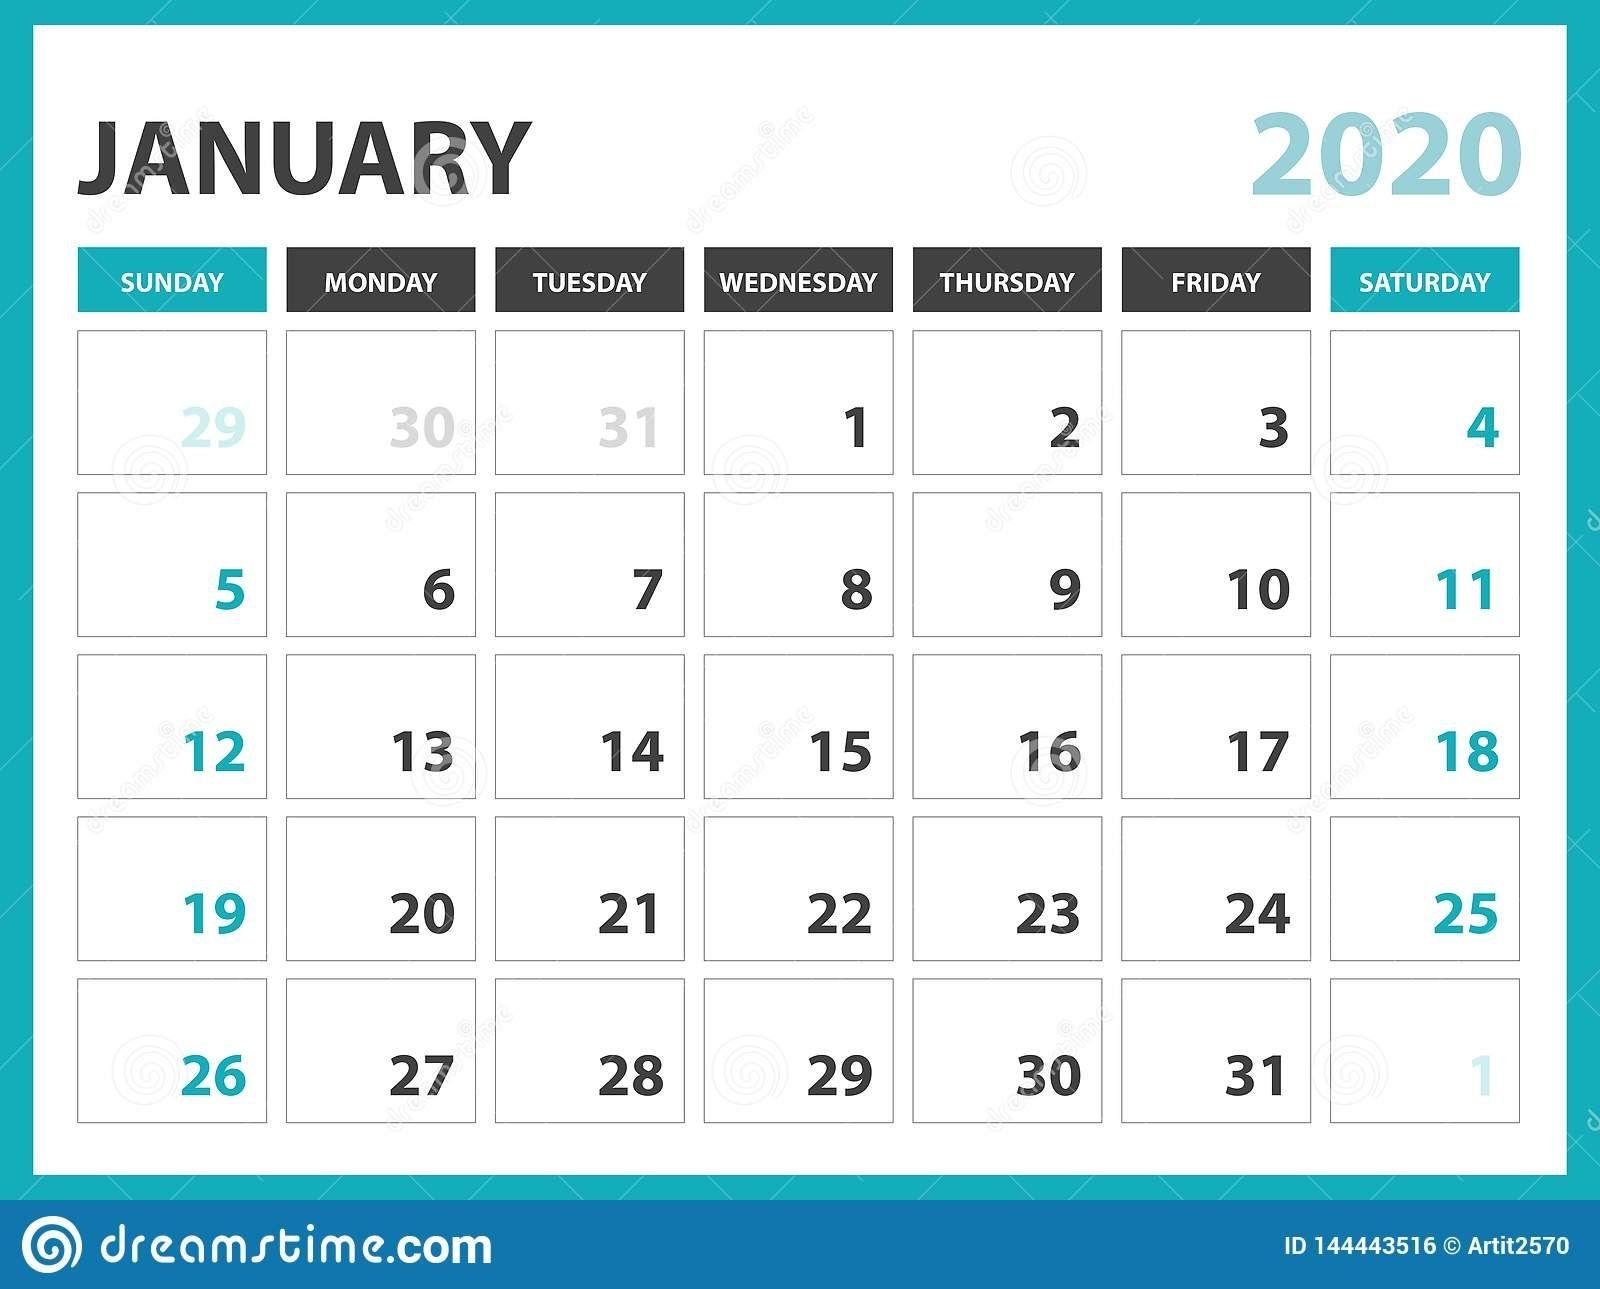 desk calendar layout size 8 x 6 inch, january 2020 calendar